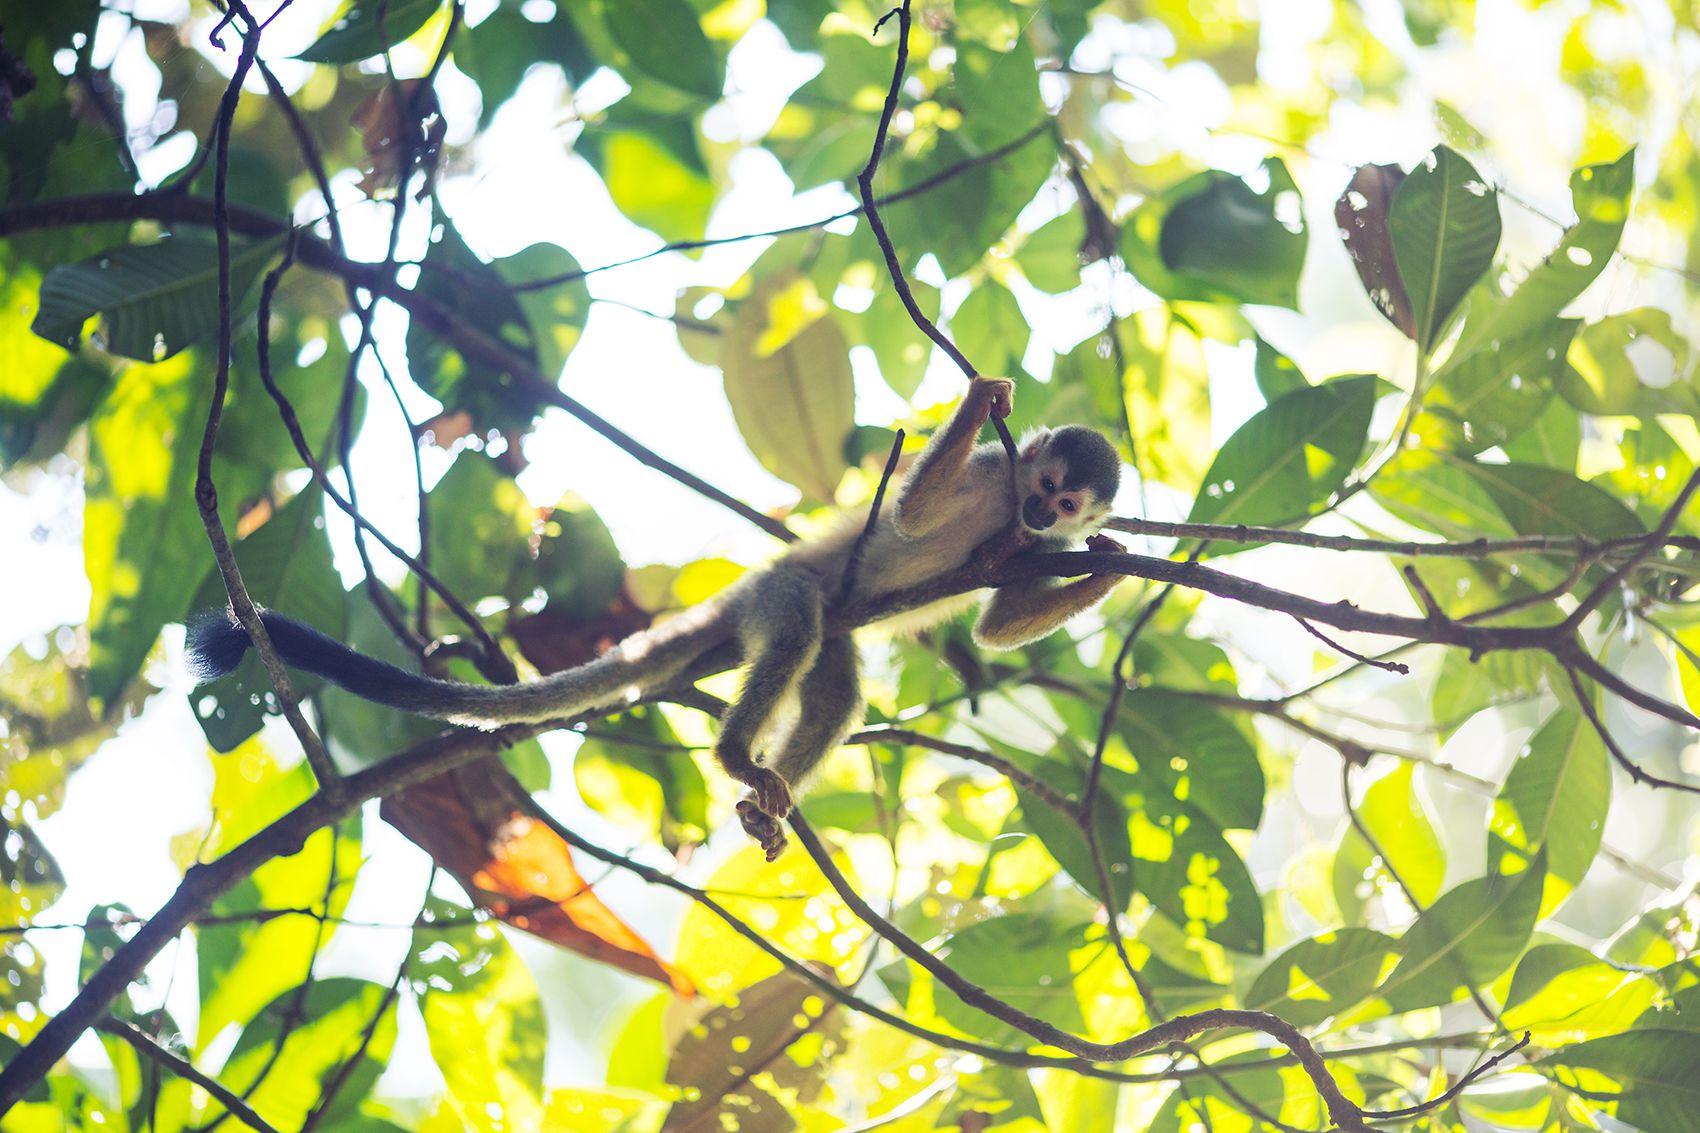 retreat_selva-armonia_yoga-november_2015-monkey2-1.jpg